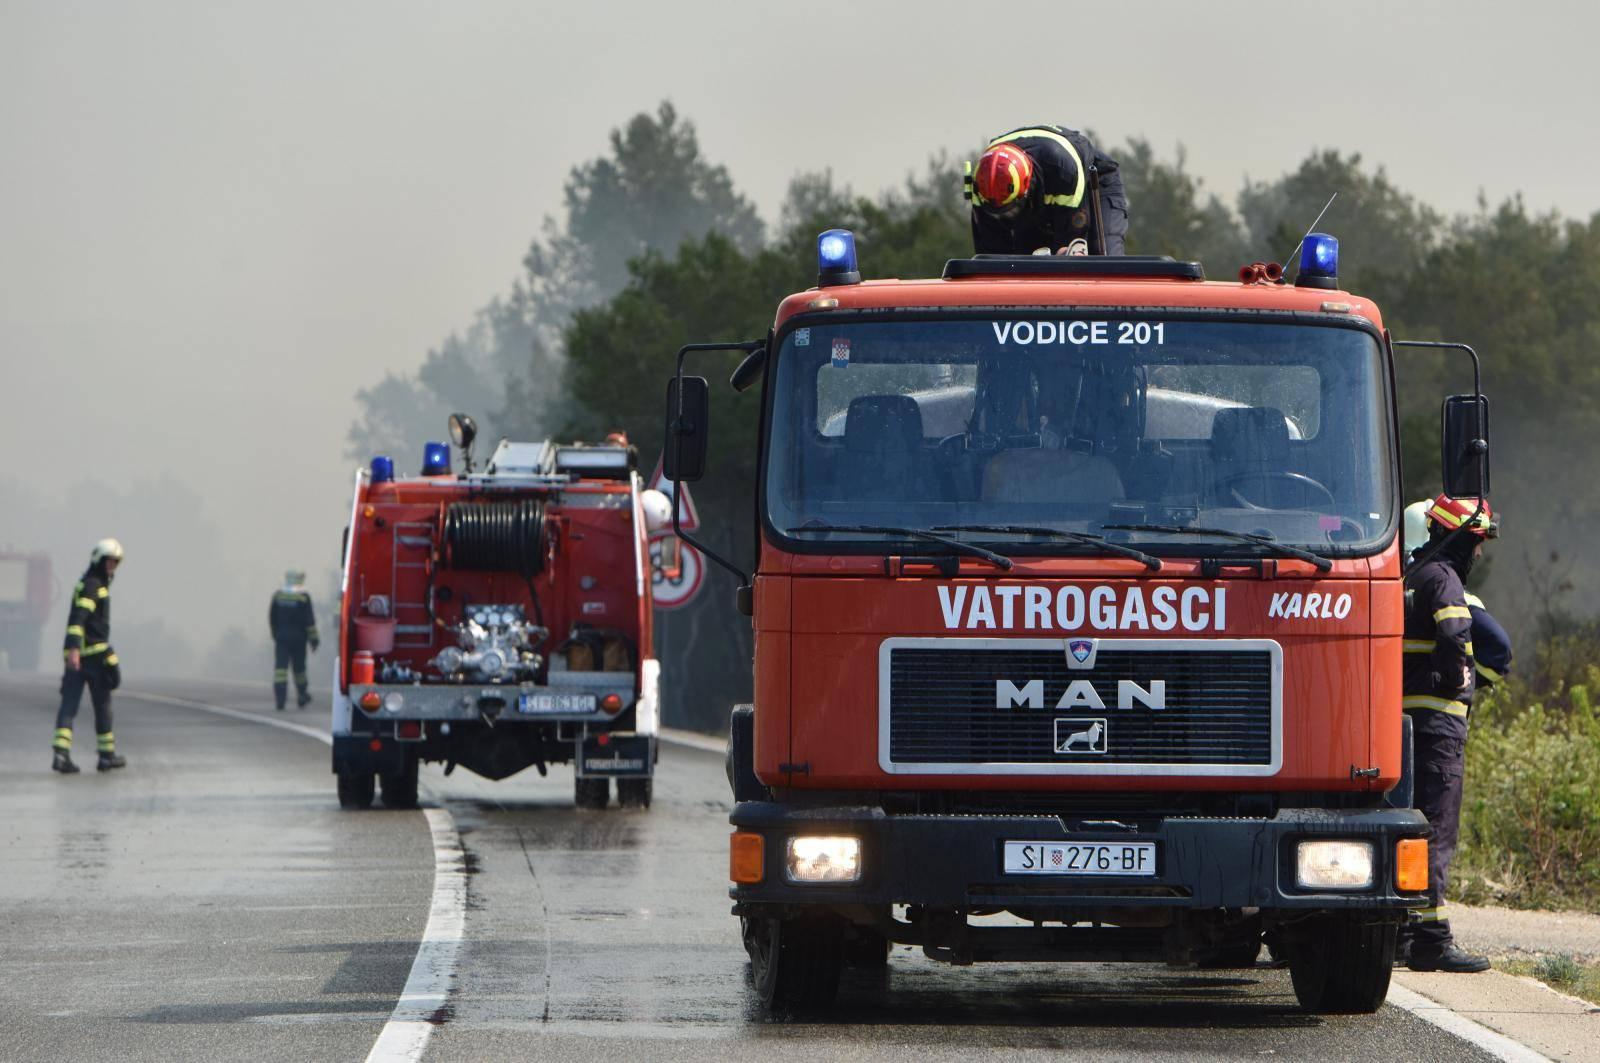 Između Srime i Vodica planuo požar, vatrogascima pomaže kanader i air tractor